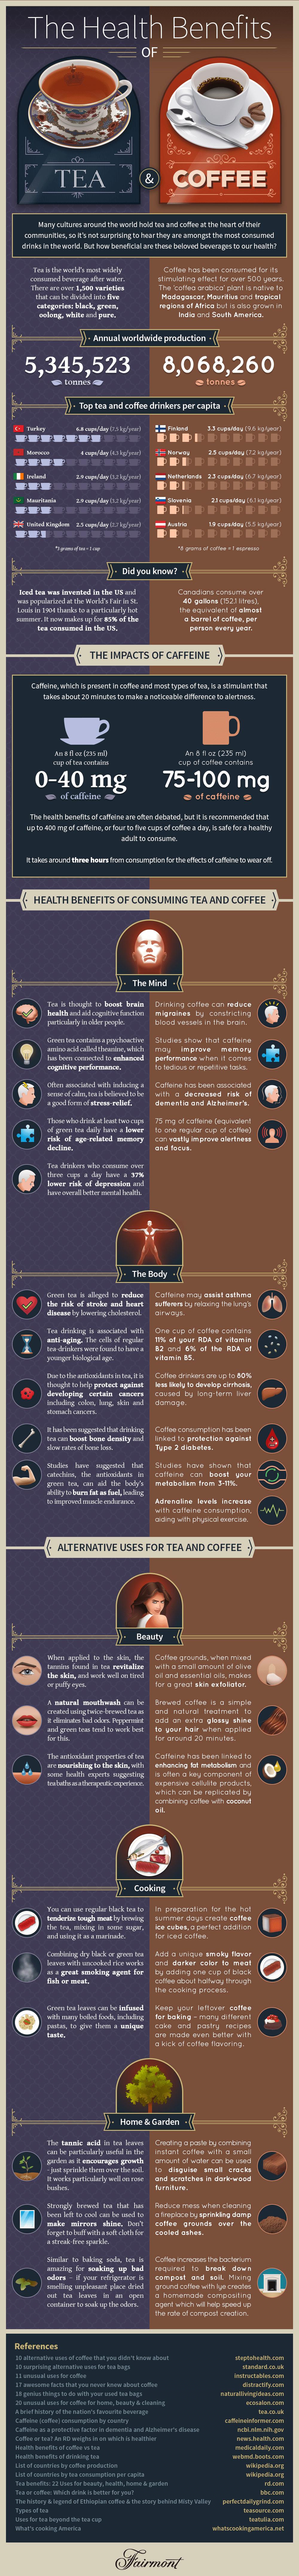 Health Benefits of Tea vs Coffee